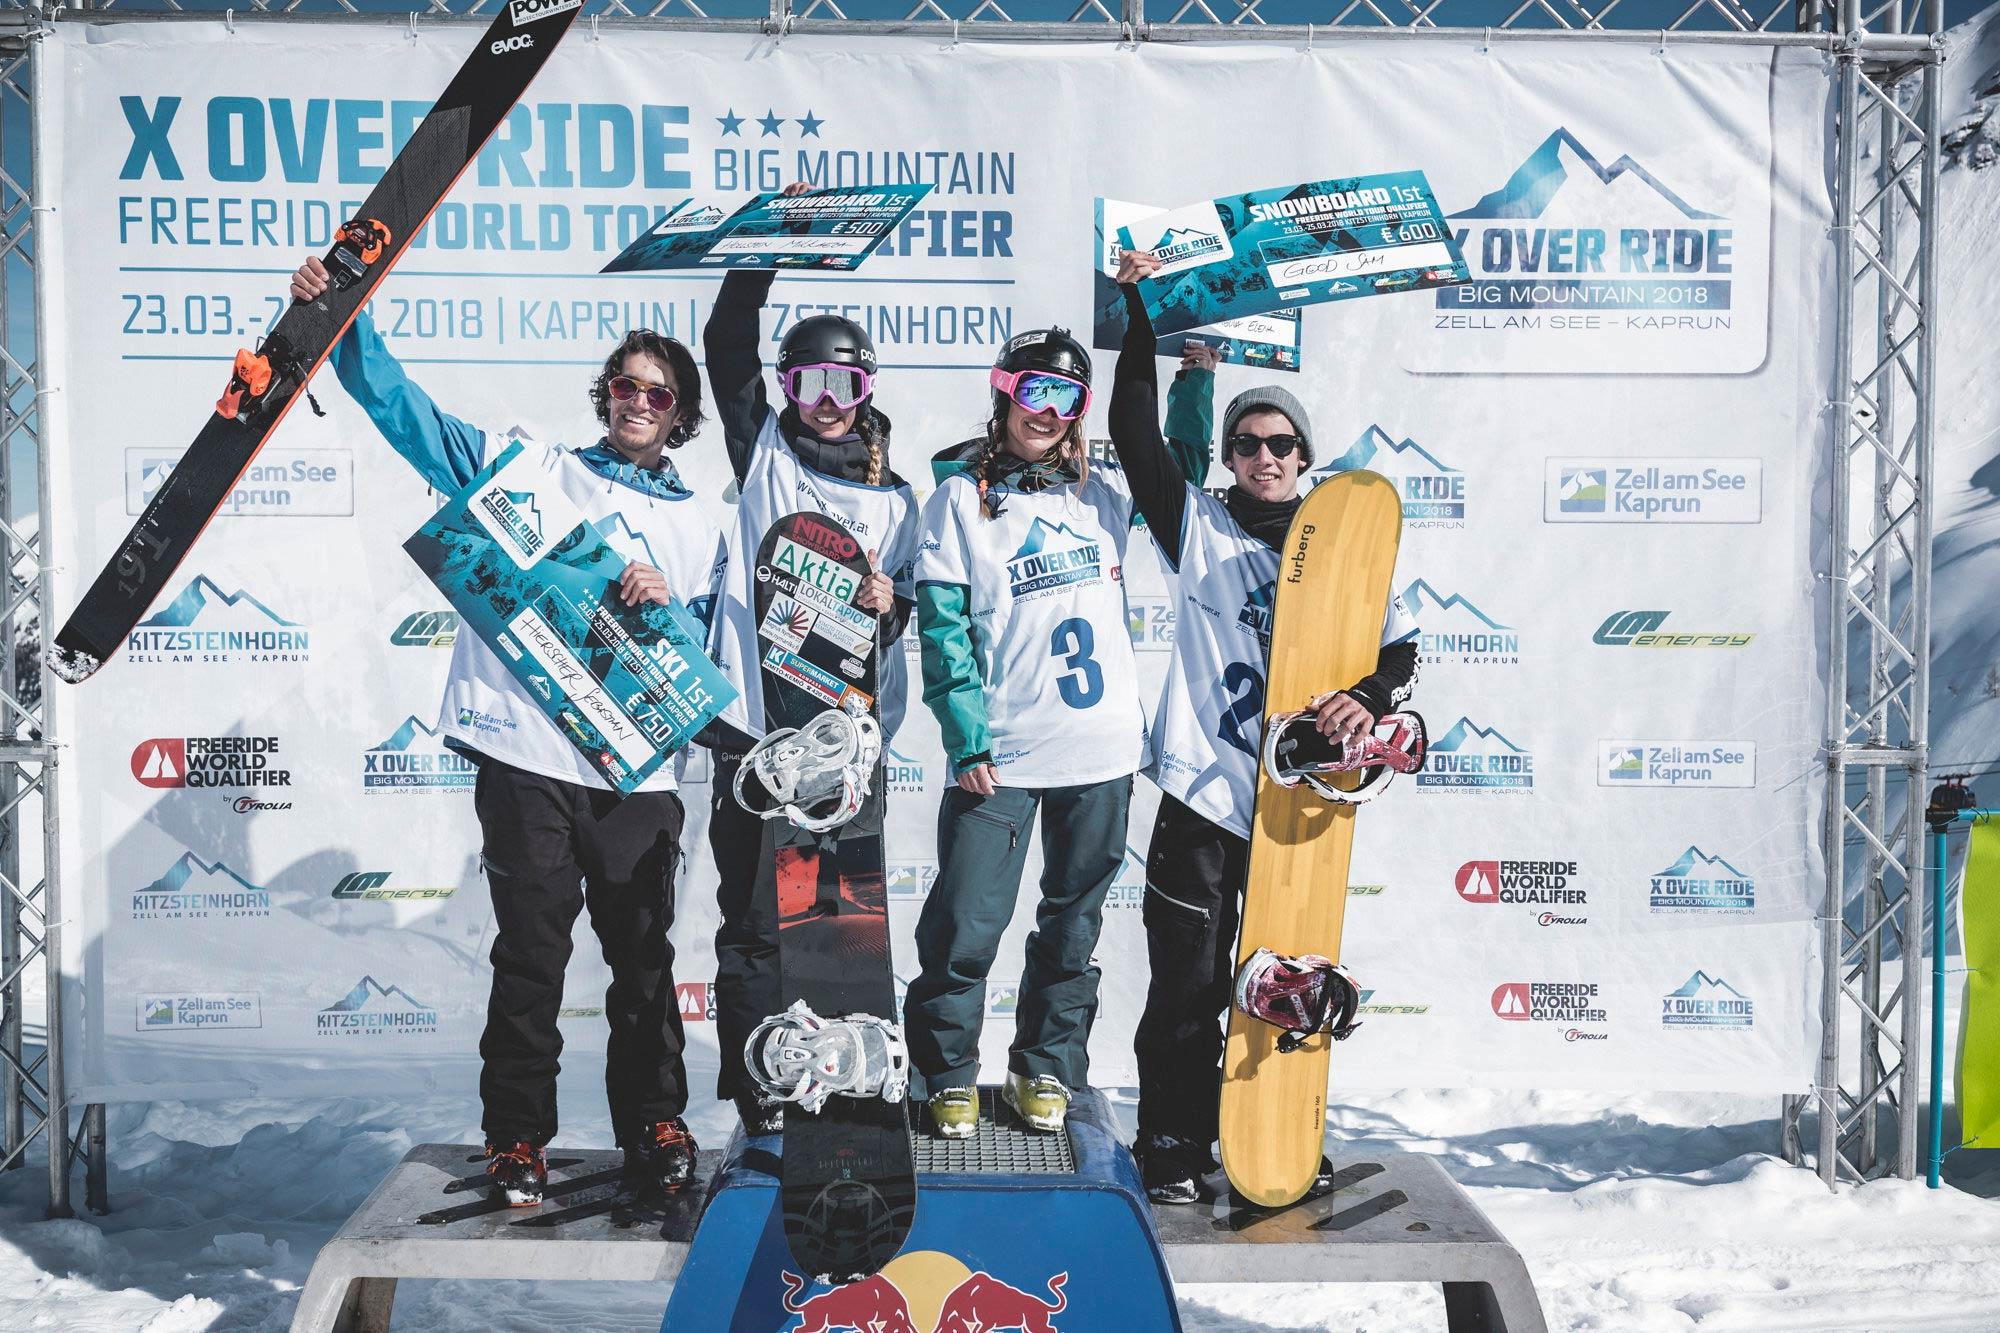 Alle Gewinner des X Over Ride 2018: Sebastian Hiersche (Ski Men), Mikaela Hollsten (Snowboard Women), Elena Mitrengova (Ski Women), Sam Good (Snowboard Men) (v.l.n.r.) - Foto: X Over / Klaus Listl